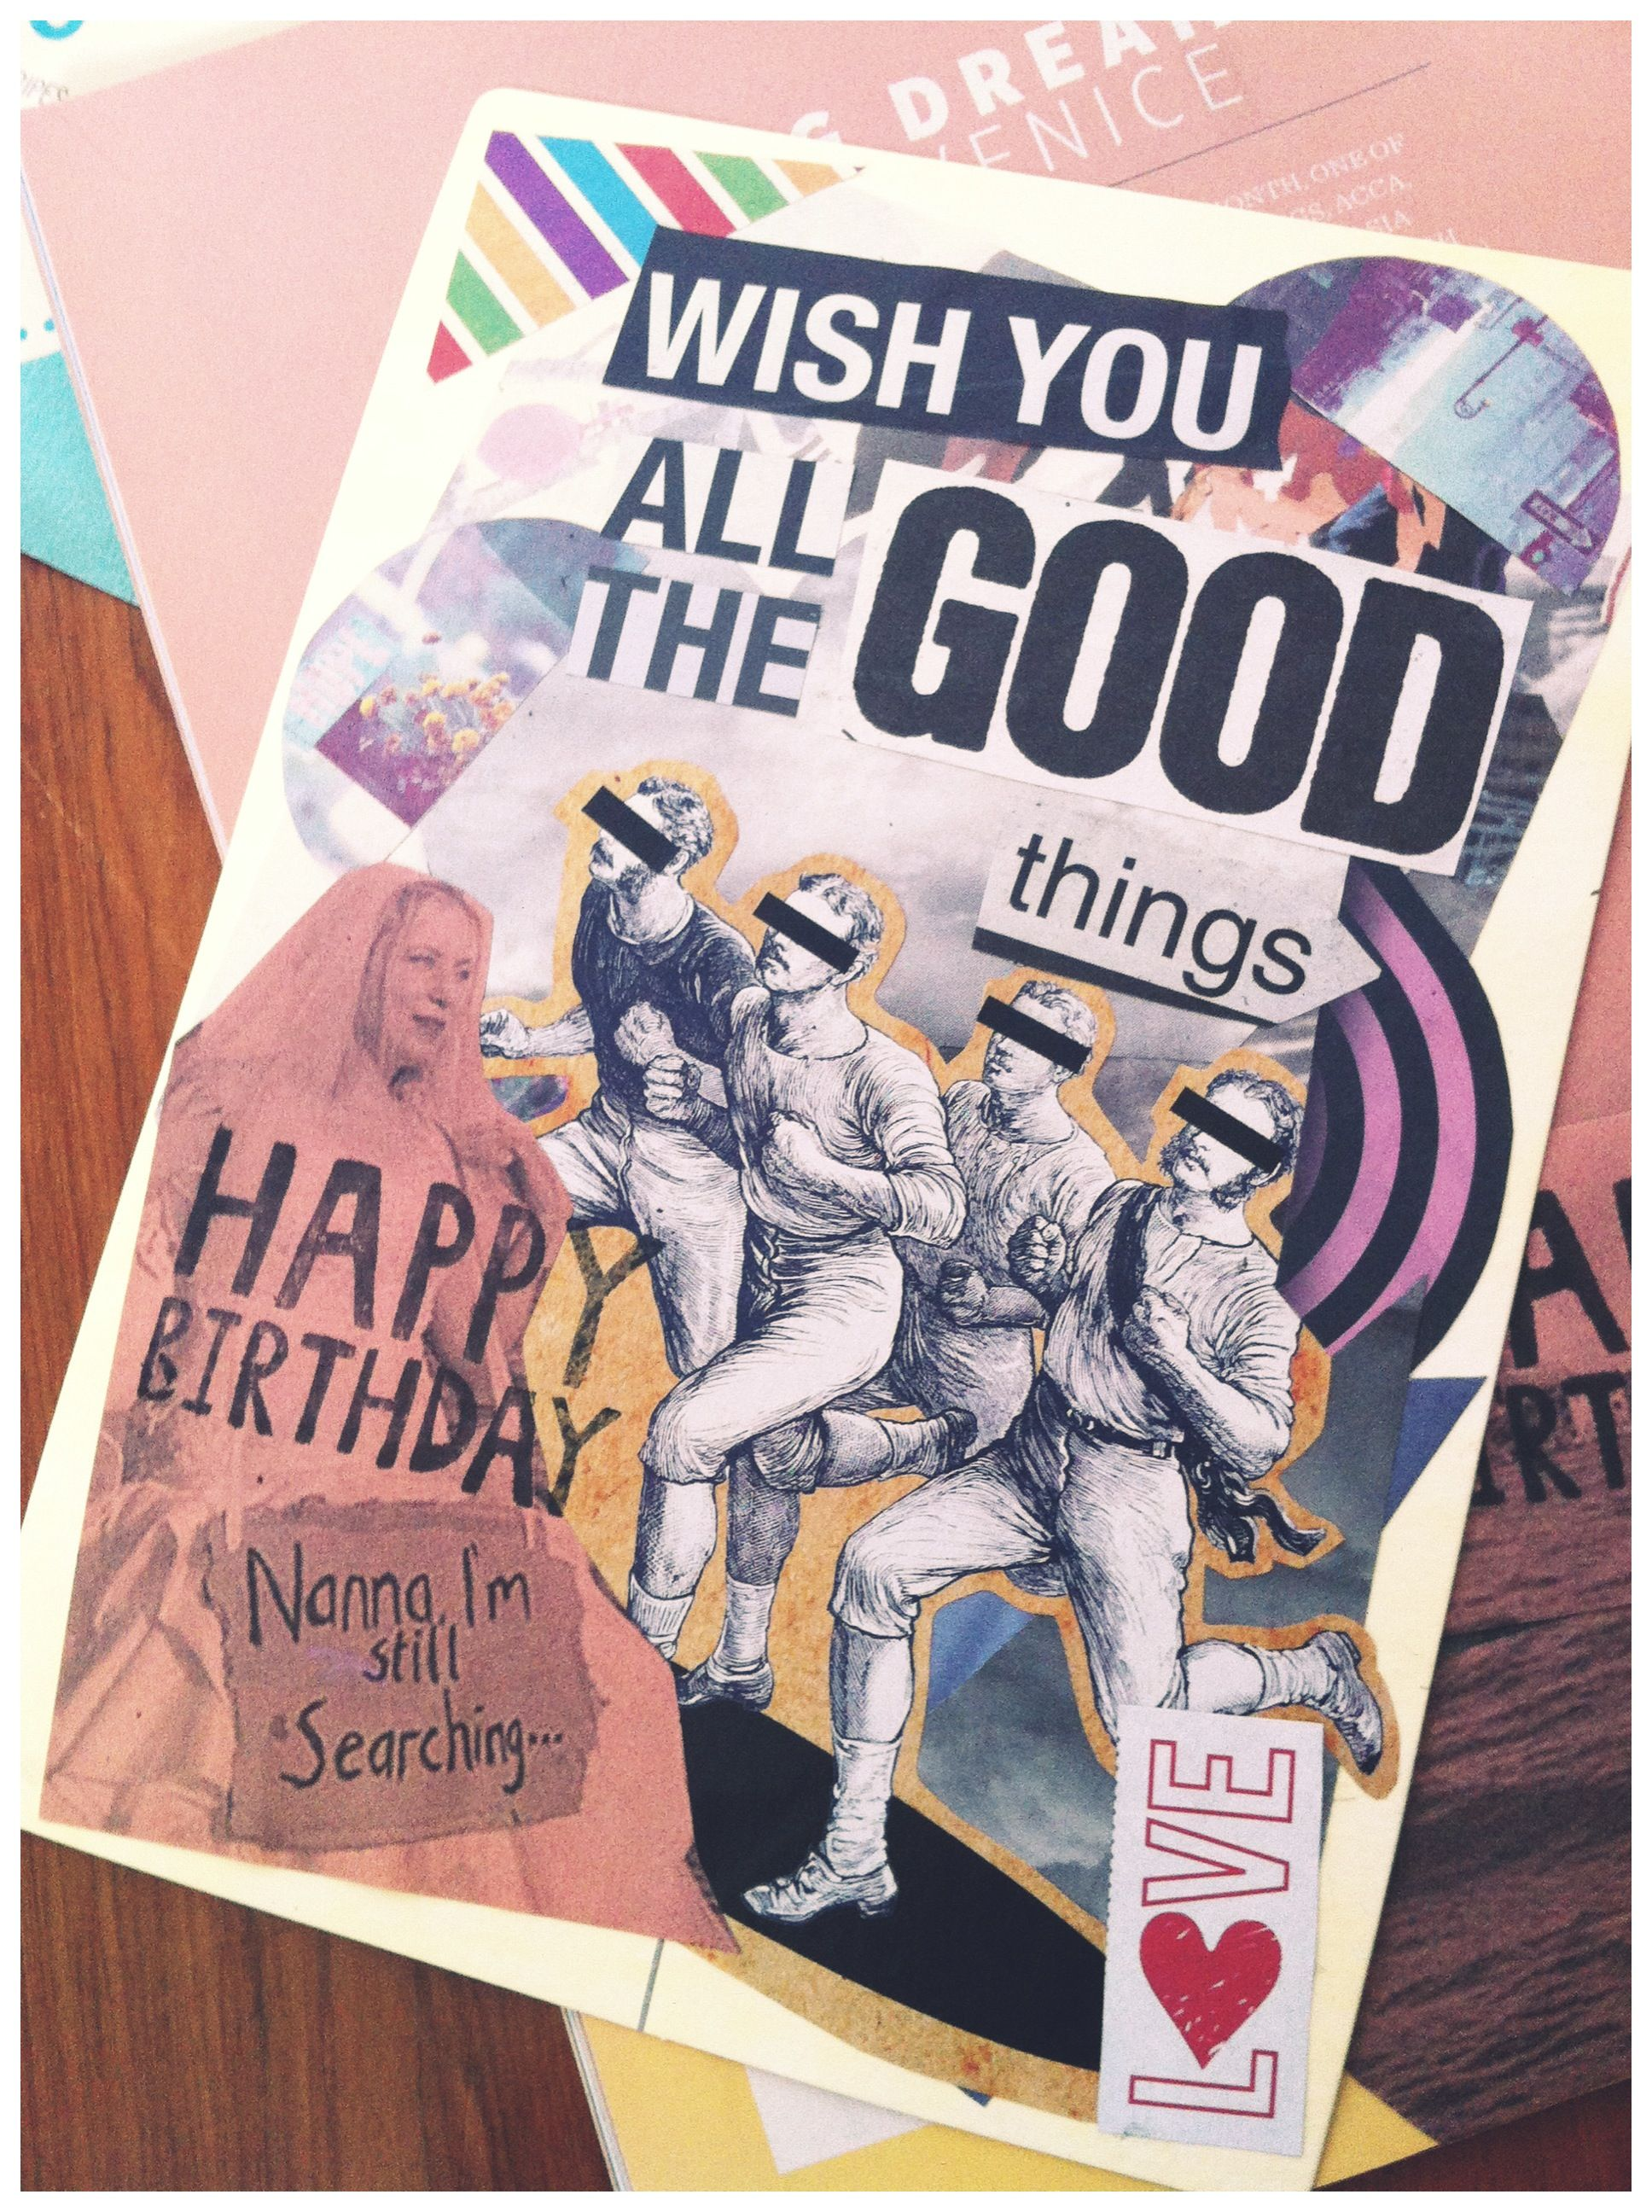 Pin By Cindy Nuamitha On Goodies Birthday Collage Birthday Cards Diy Diy Cards